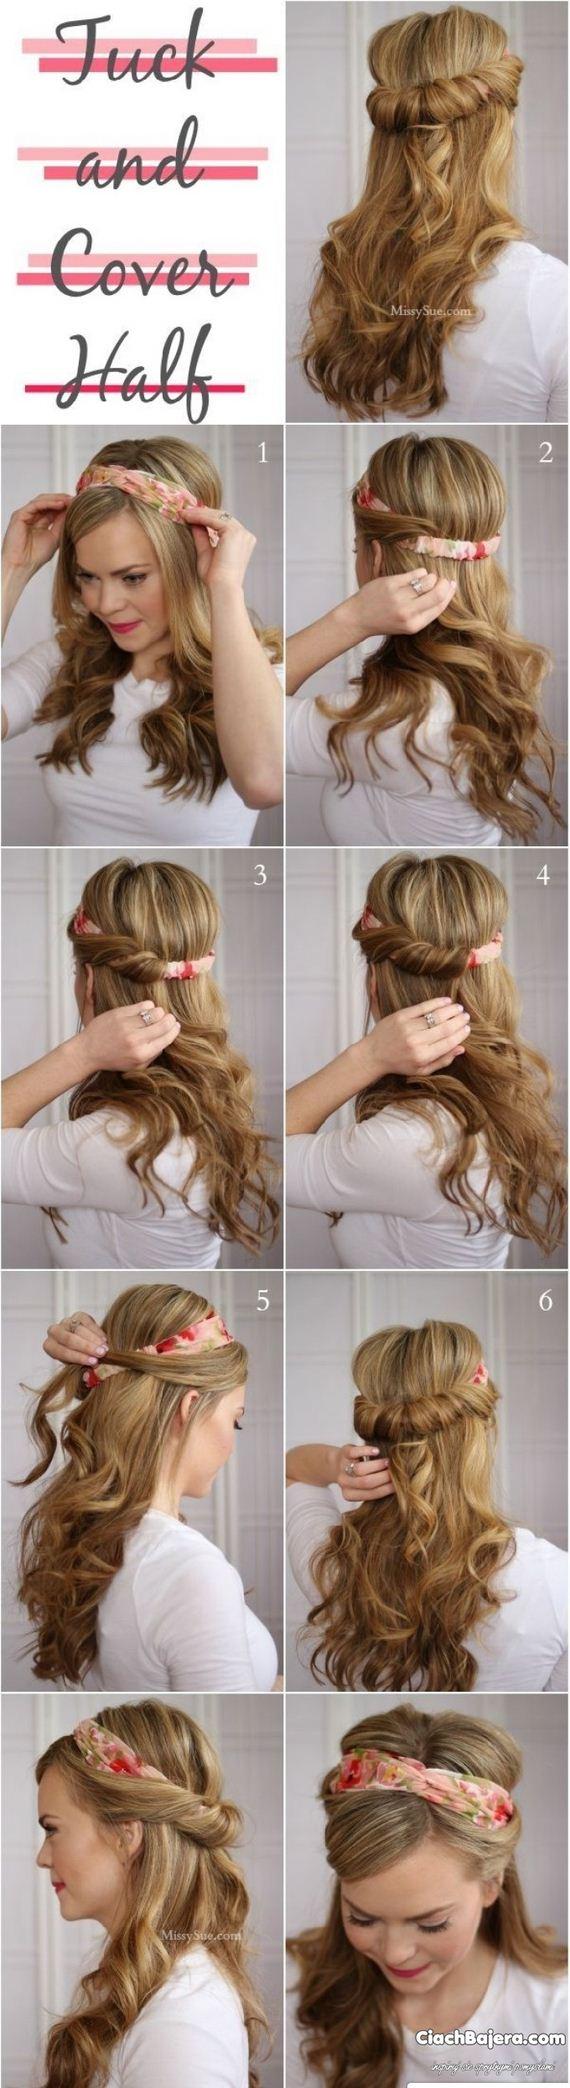 10-Simple- Easy